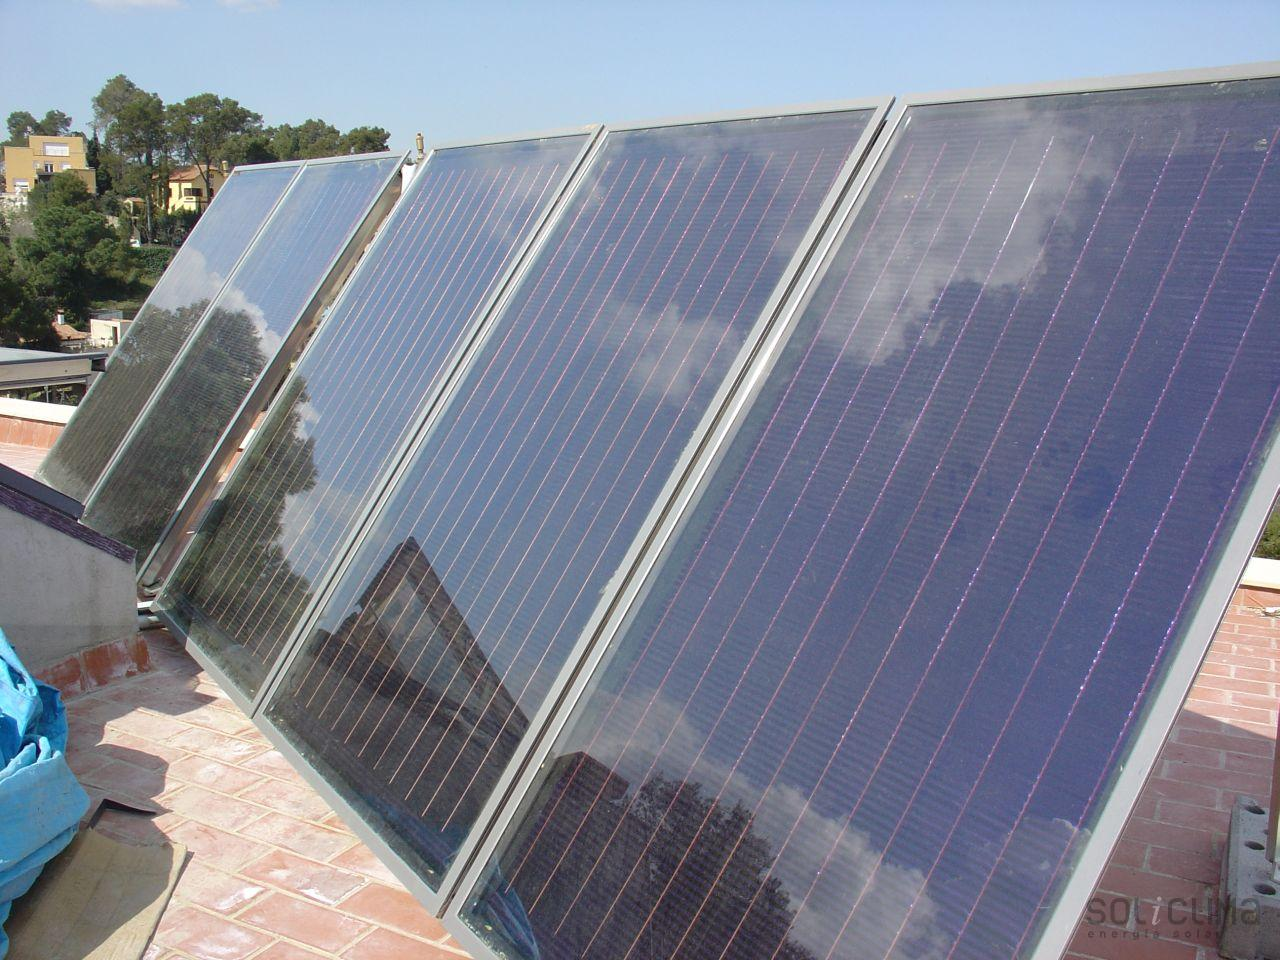 Agua caliente y calefacci n solar - Agua caliente solar ...